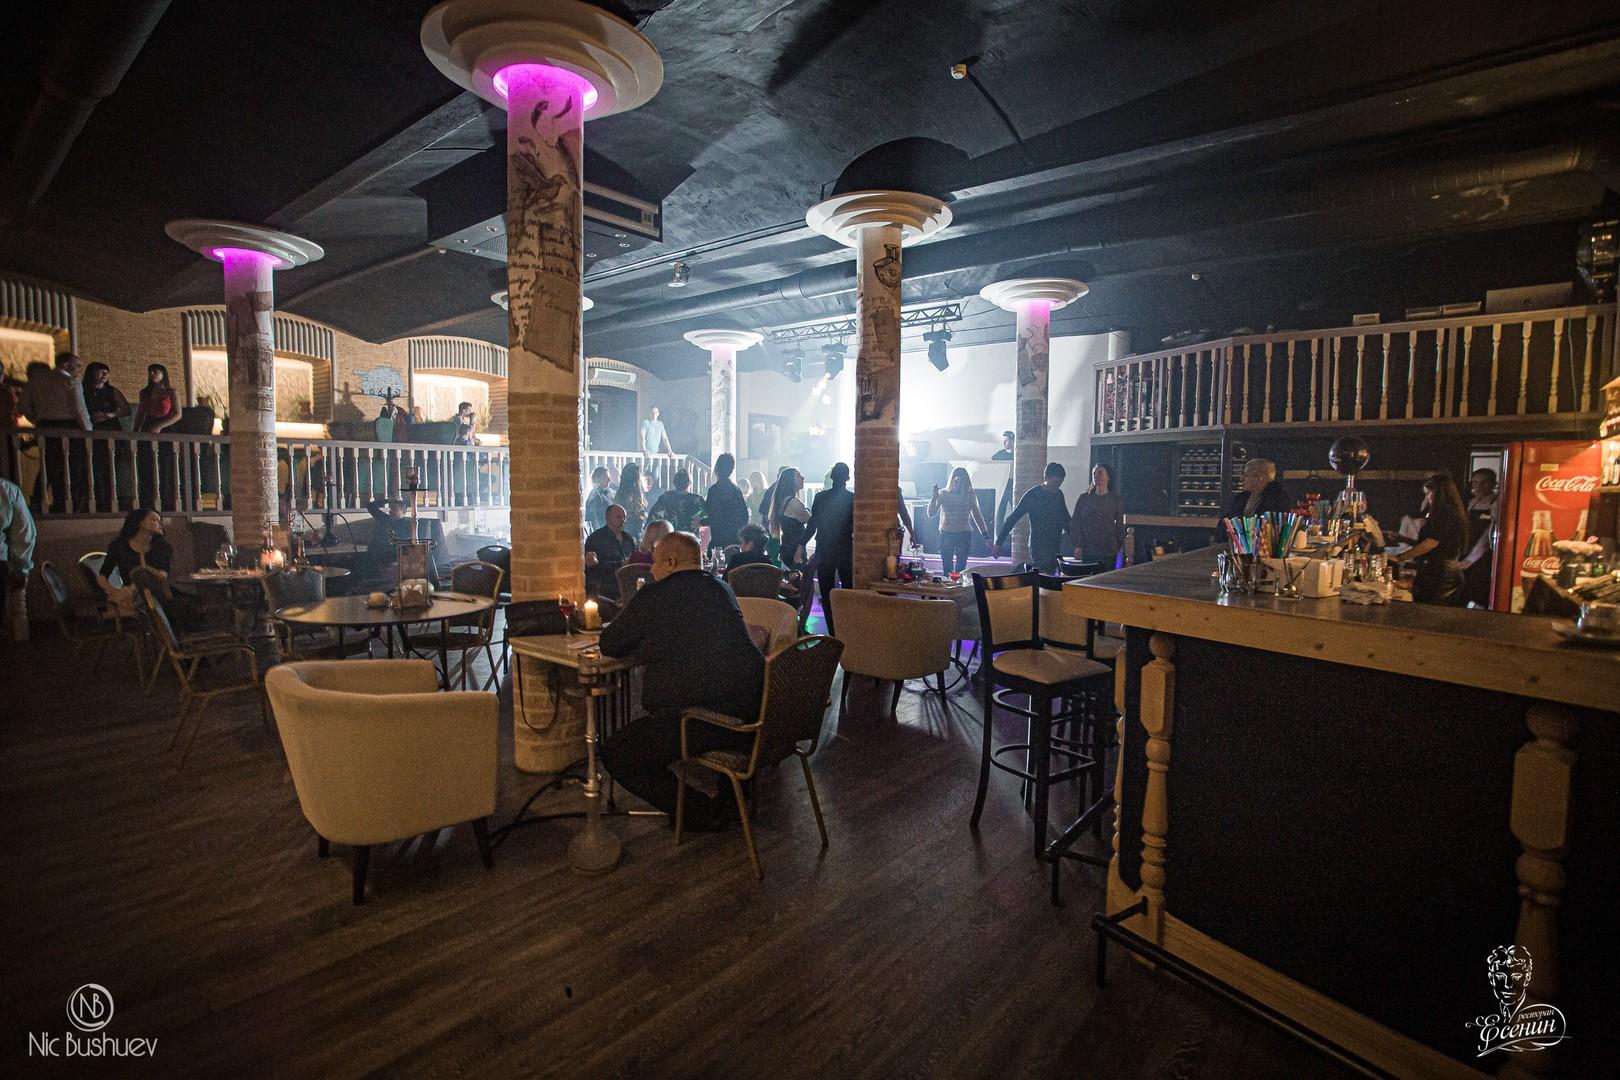 Ресторан Орехово-Зуево Есенин 14_02_2020 (69)